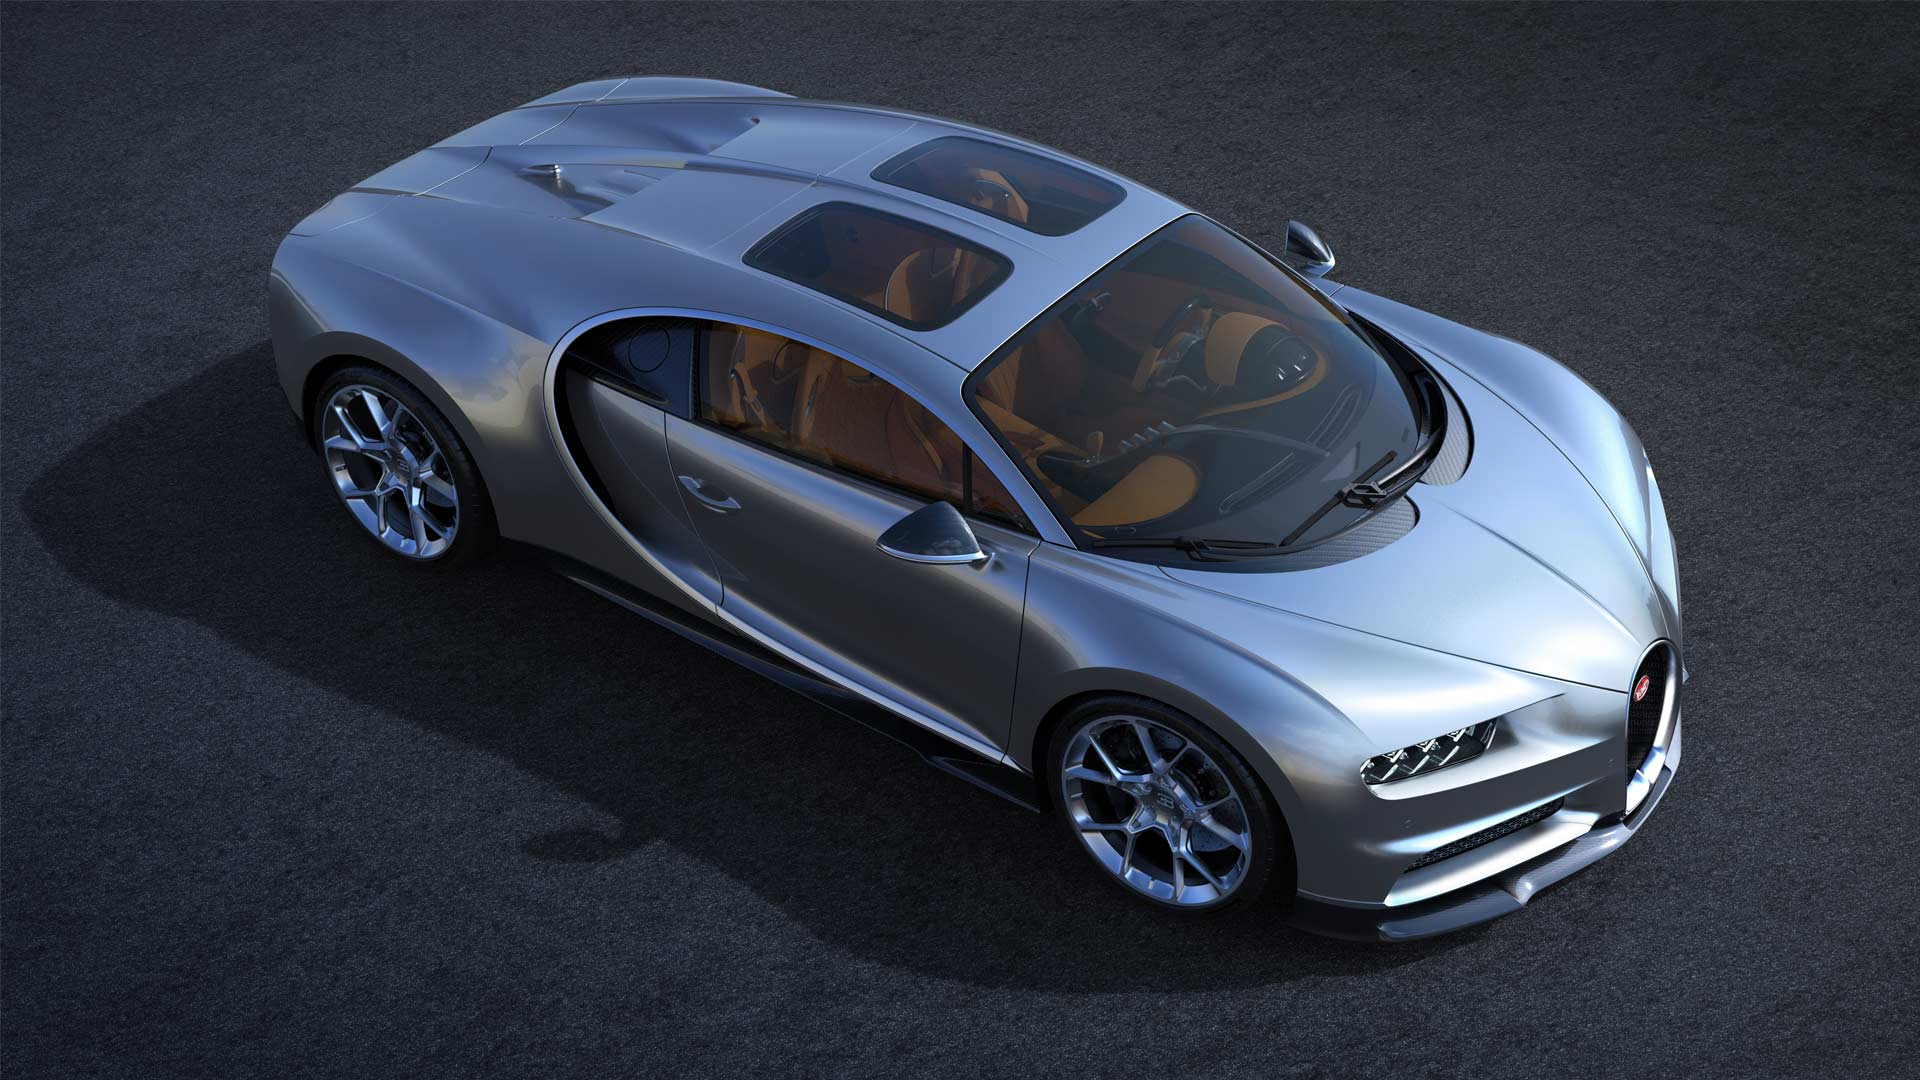 Bugatti-Chiron-Sky-View-glass-roof